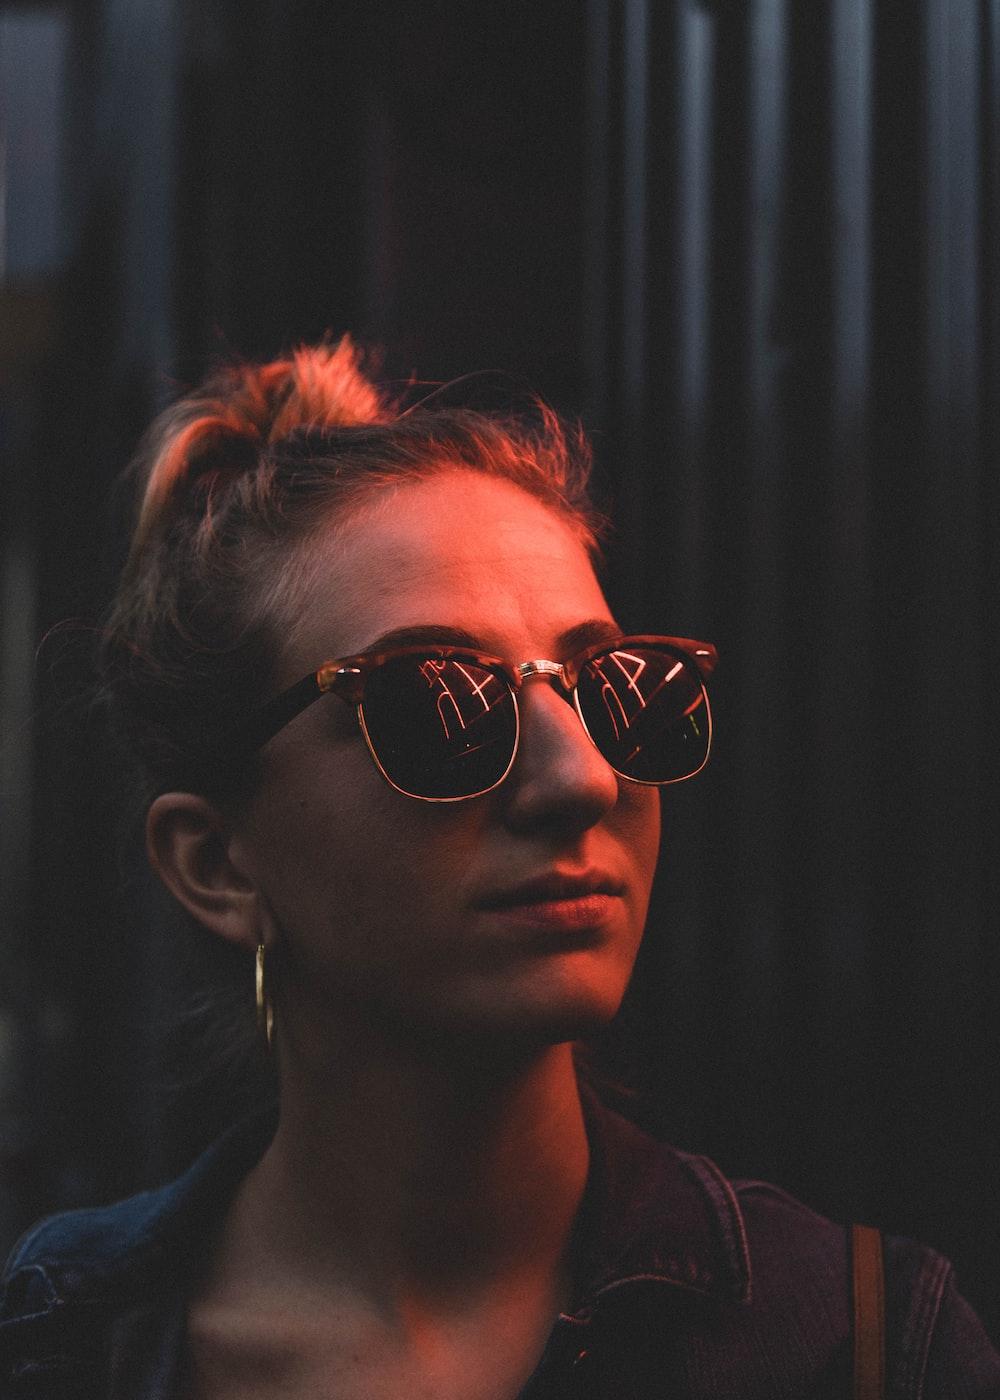 portrait of woman wearing black sunglasses